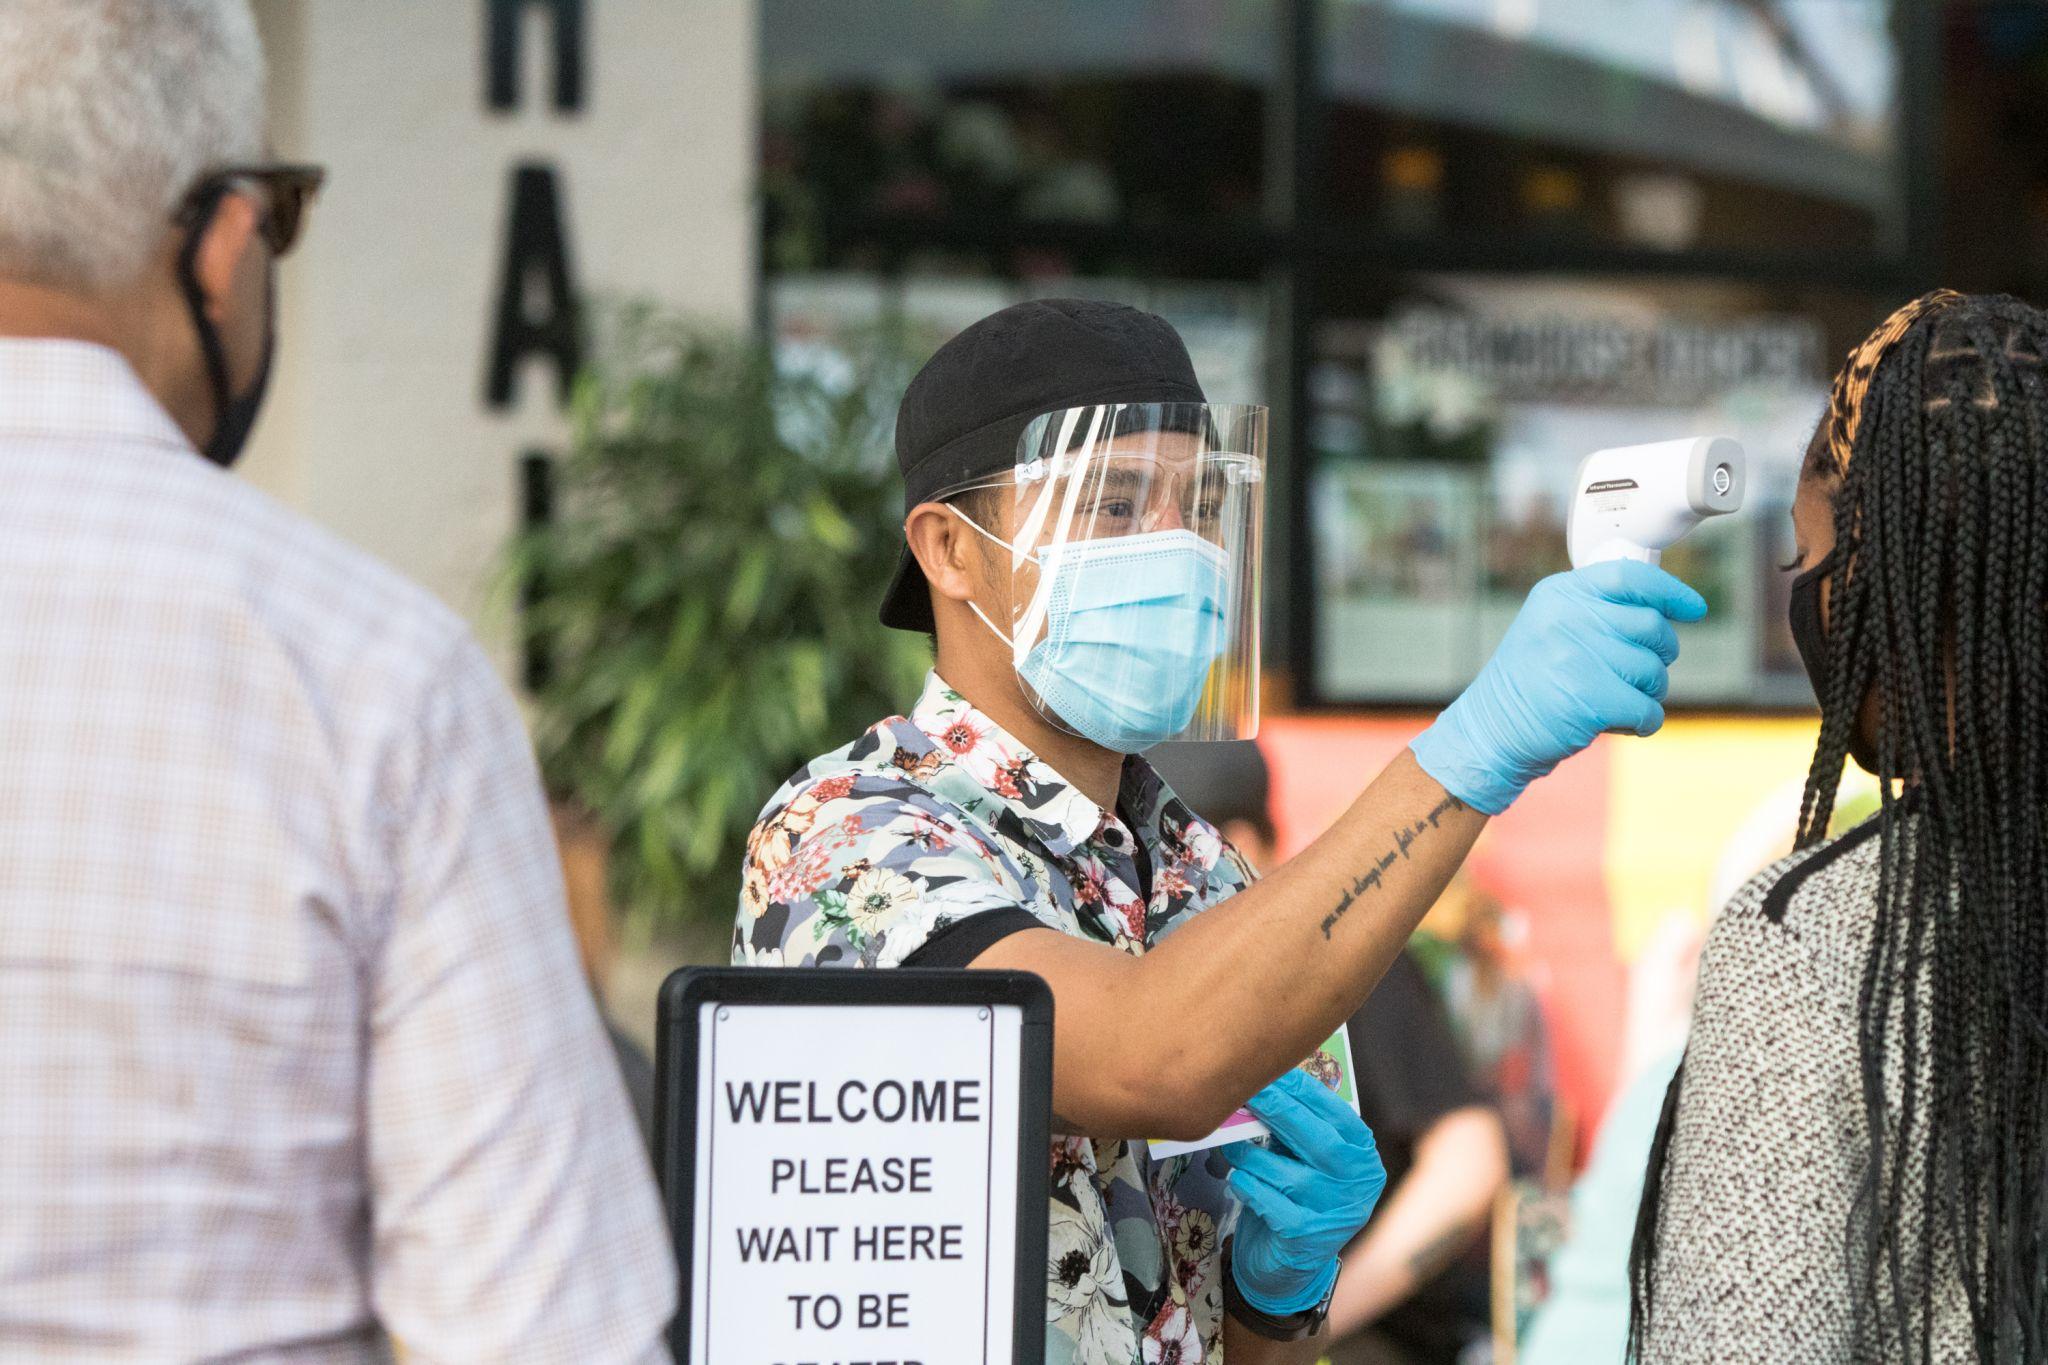 California scales down projections for Bay Area coronavirus spread